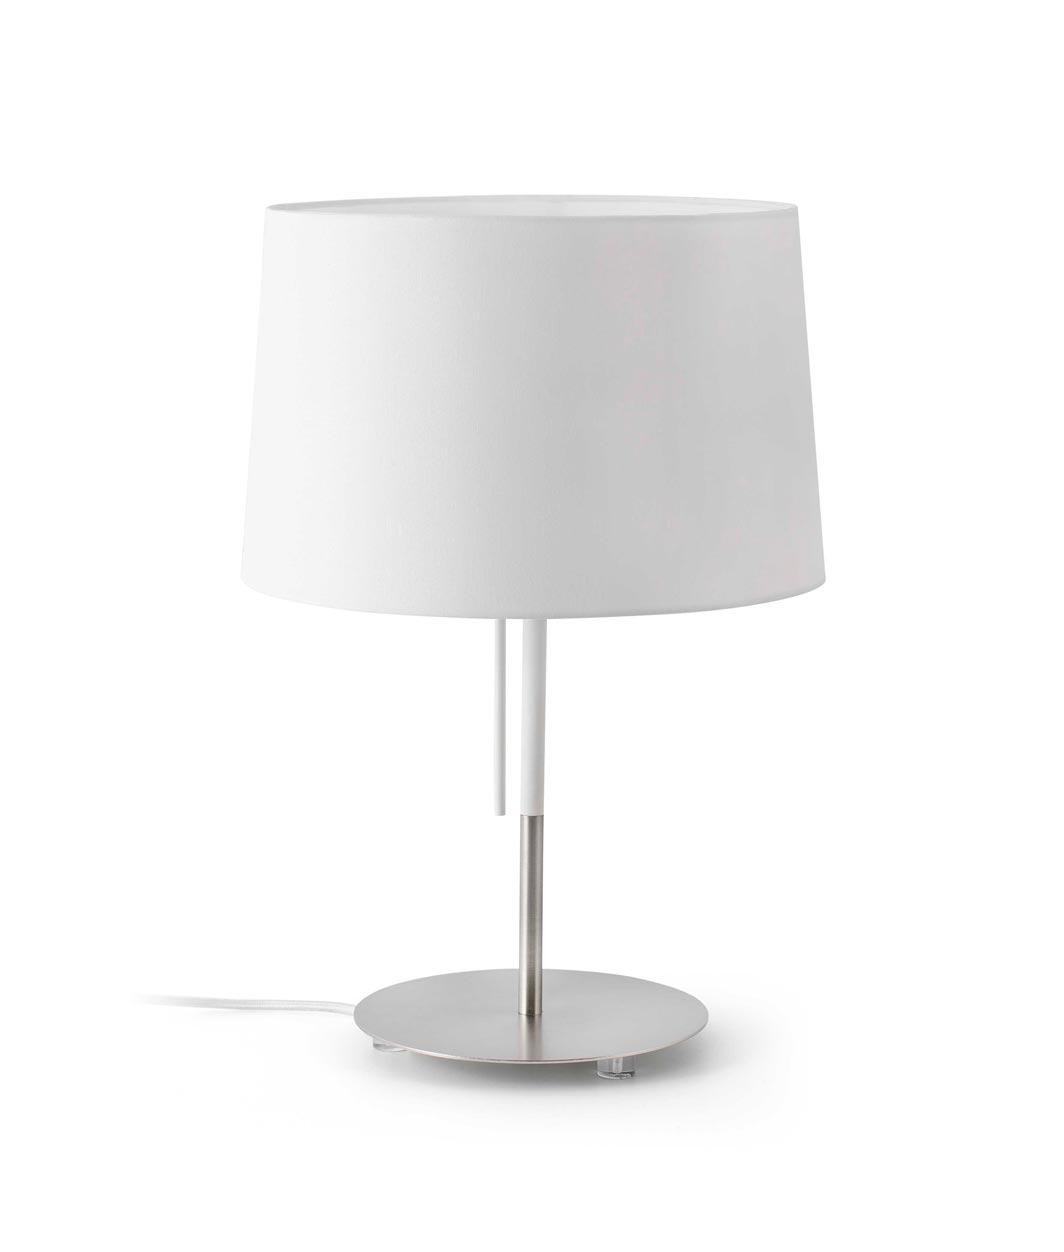 Lámpara de mesa blanca VOLTA